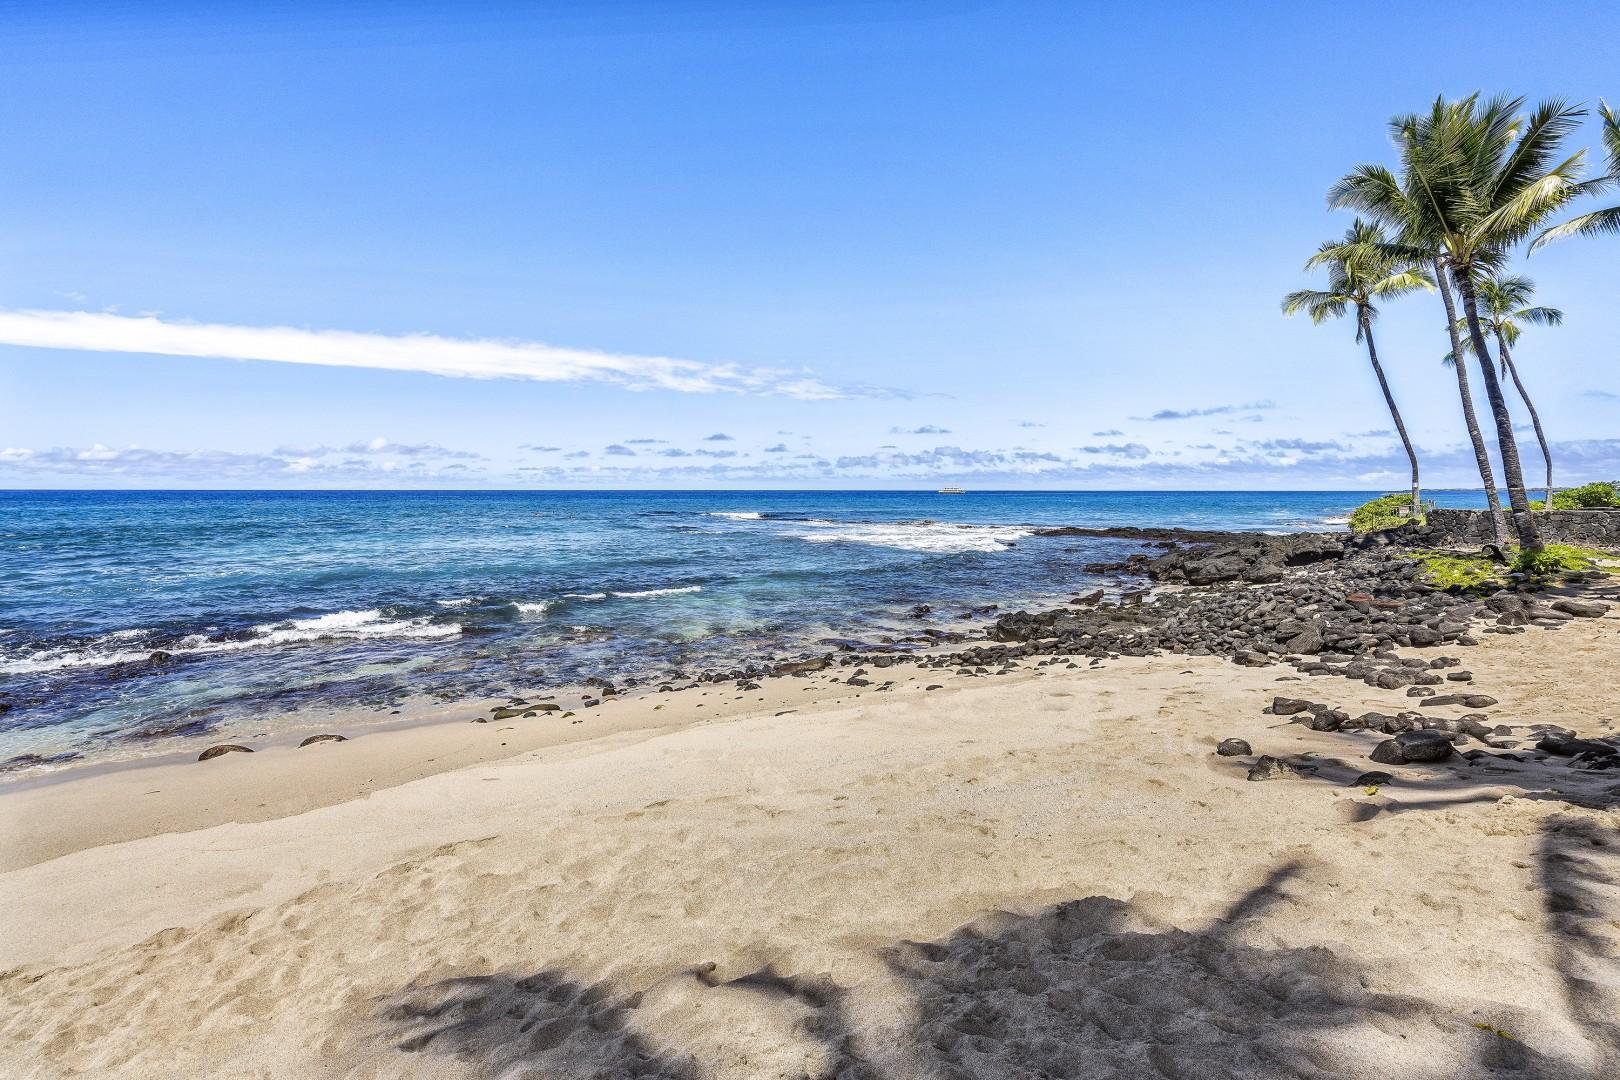 Honls beach is less than 5 minutes away!